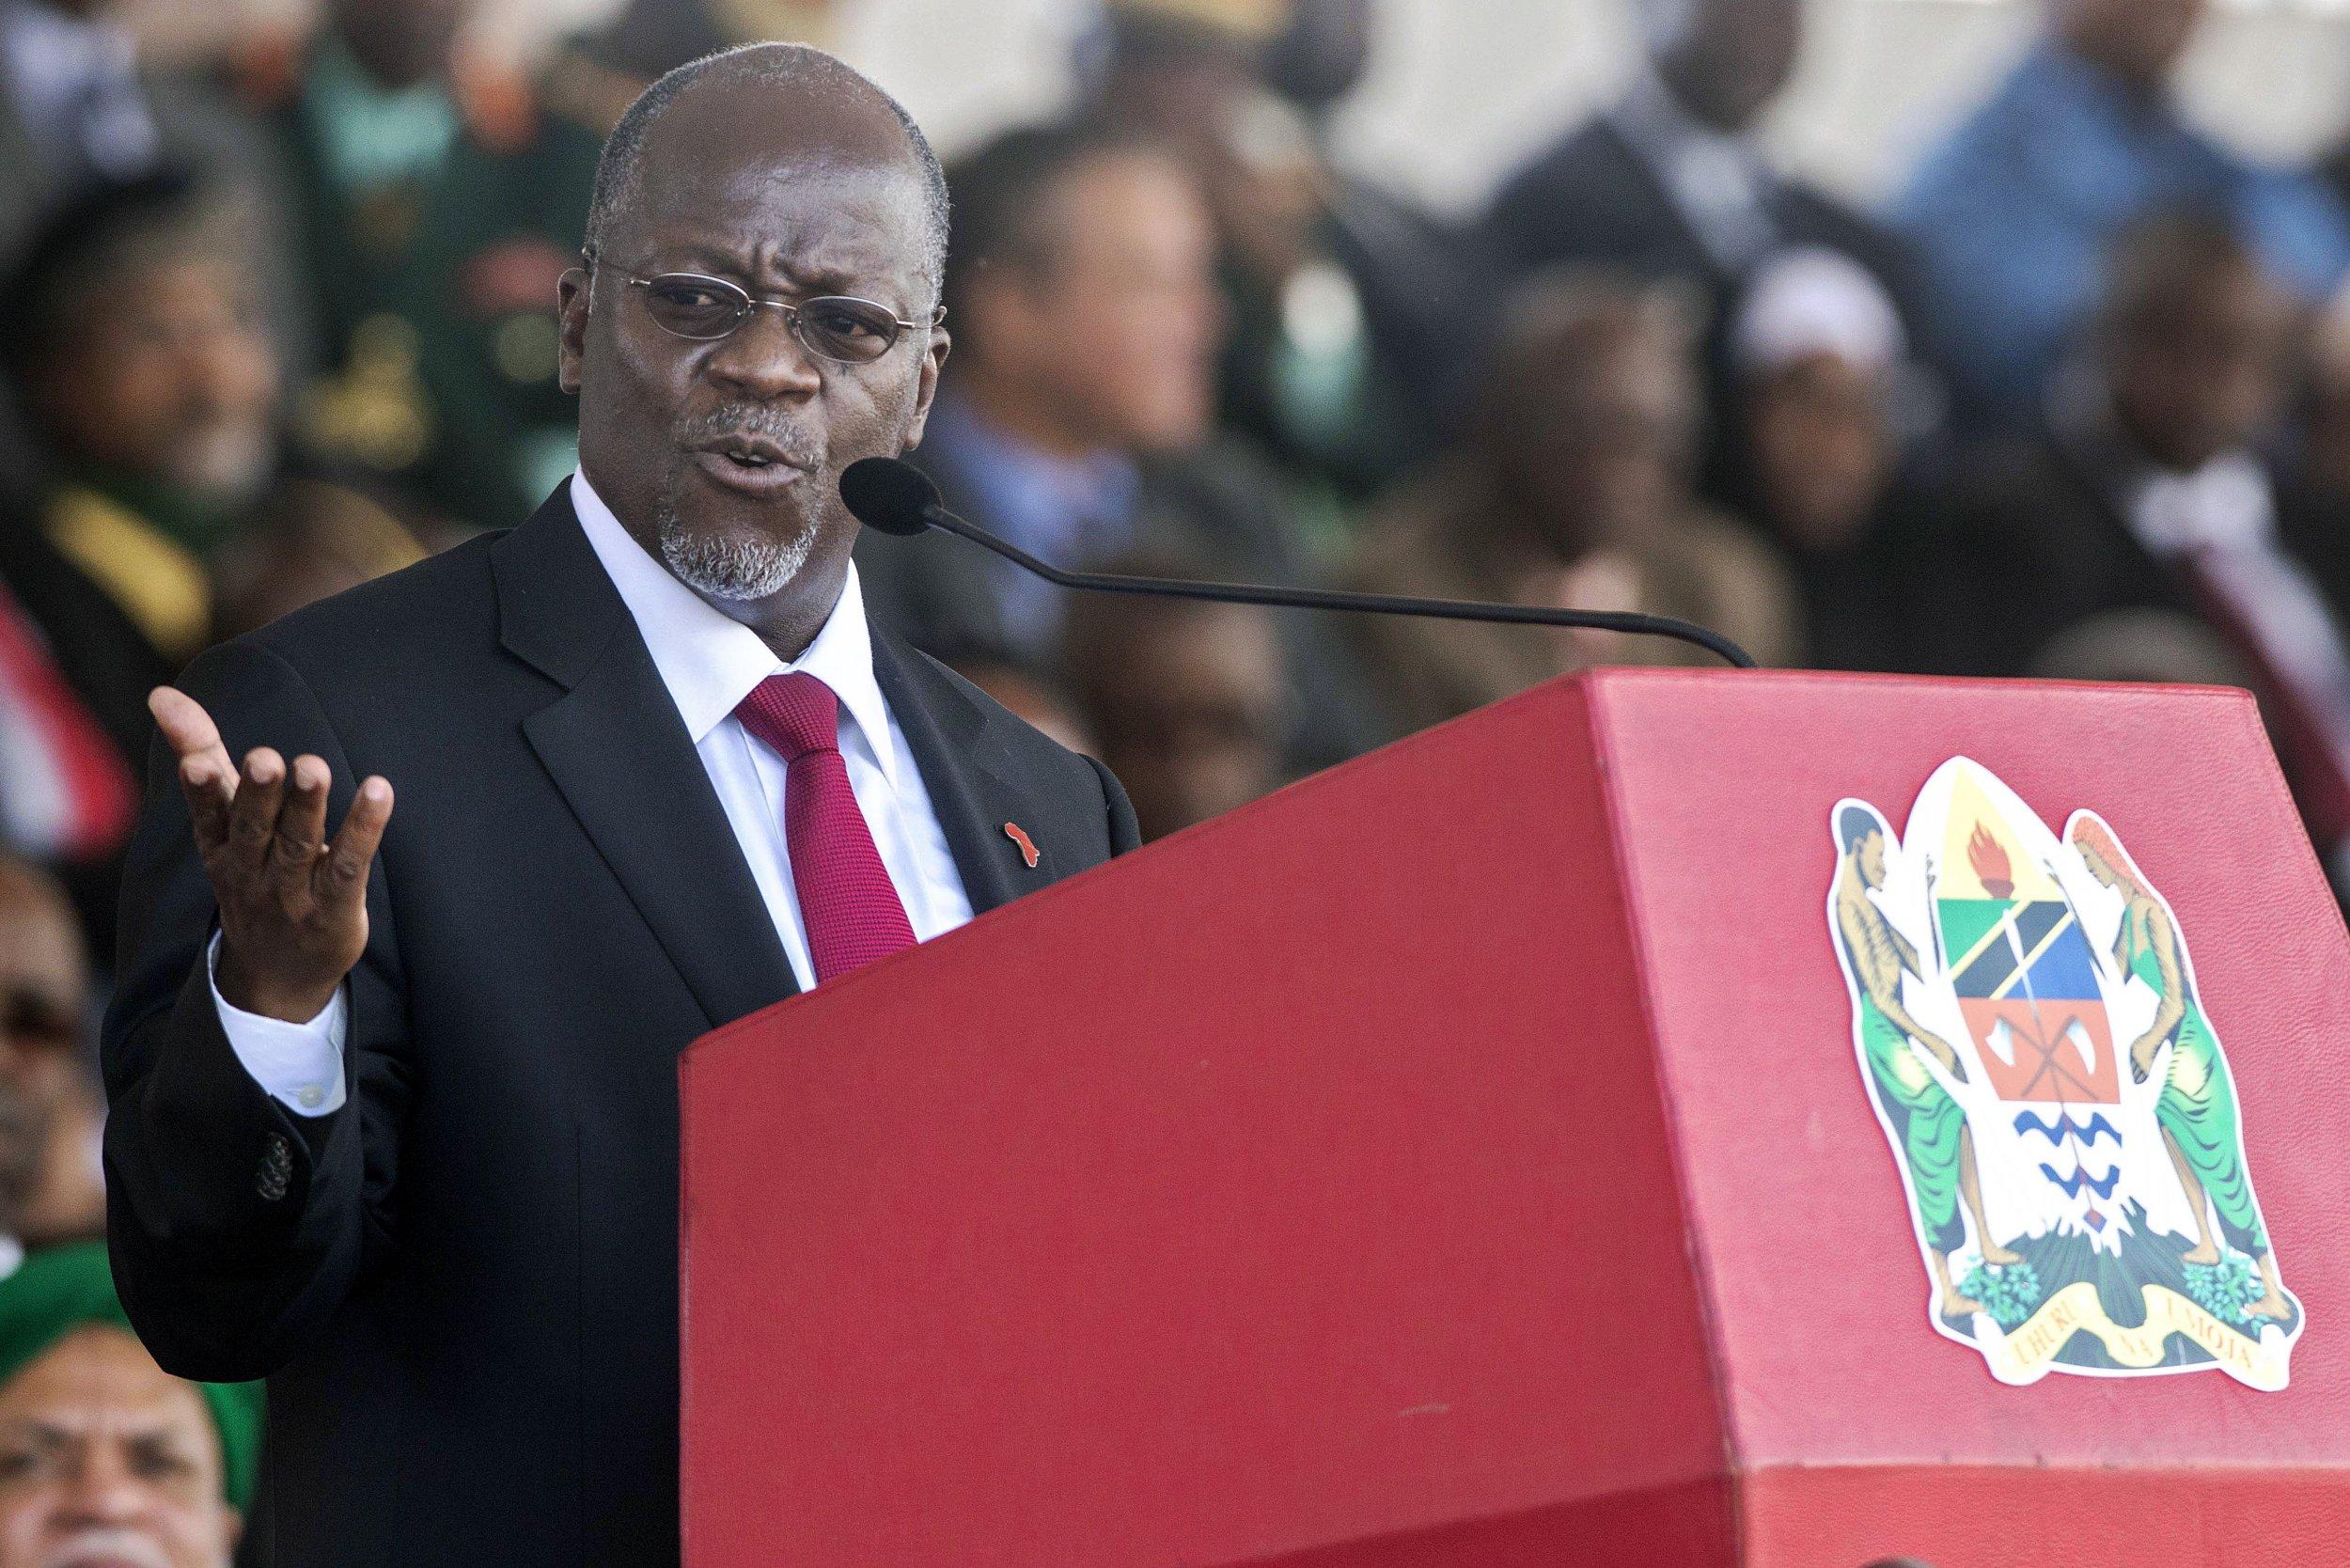 Tanzanian President John Magufuli speaks at his swearing in ceremony.